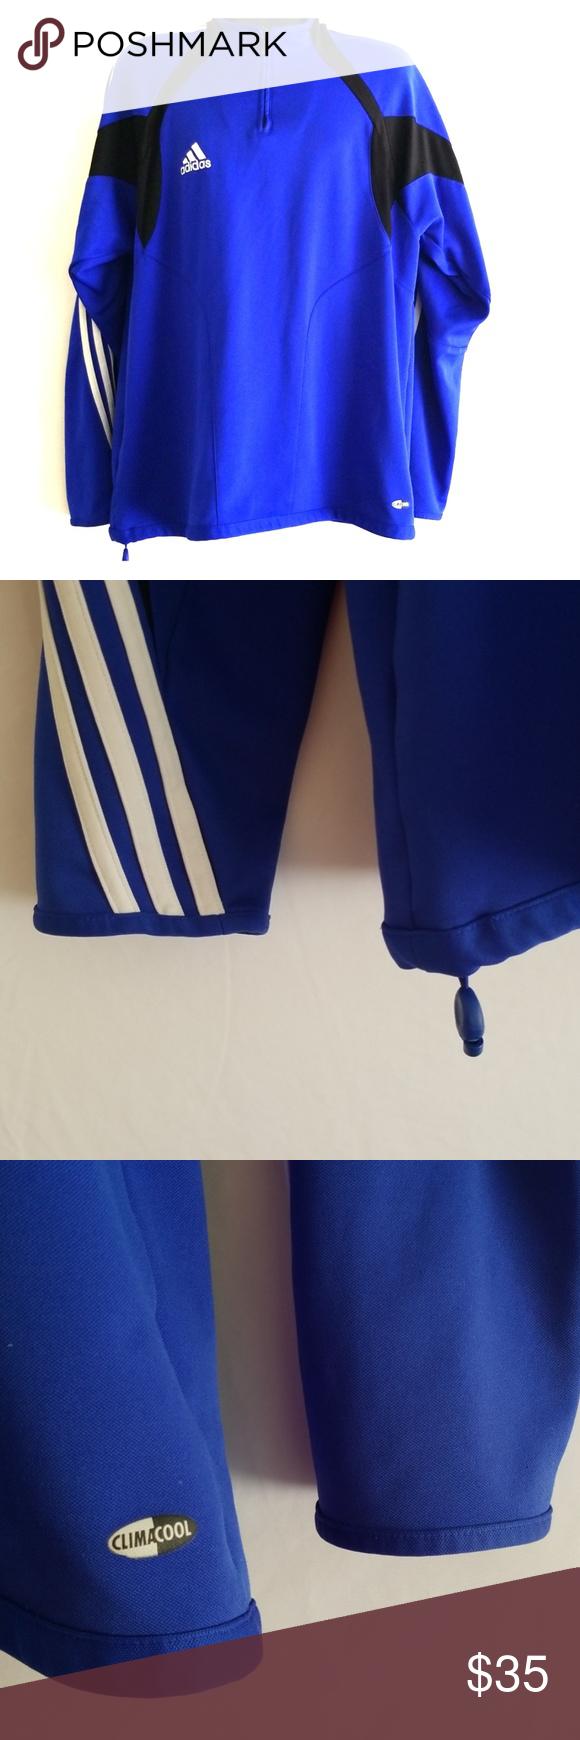 Adidas Mens XL Longsleeve Half Zip Climacool Shirt ☆Adidas Blue ...